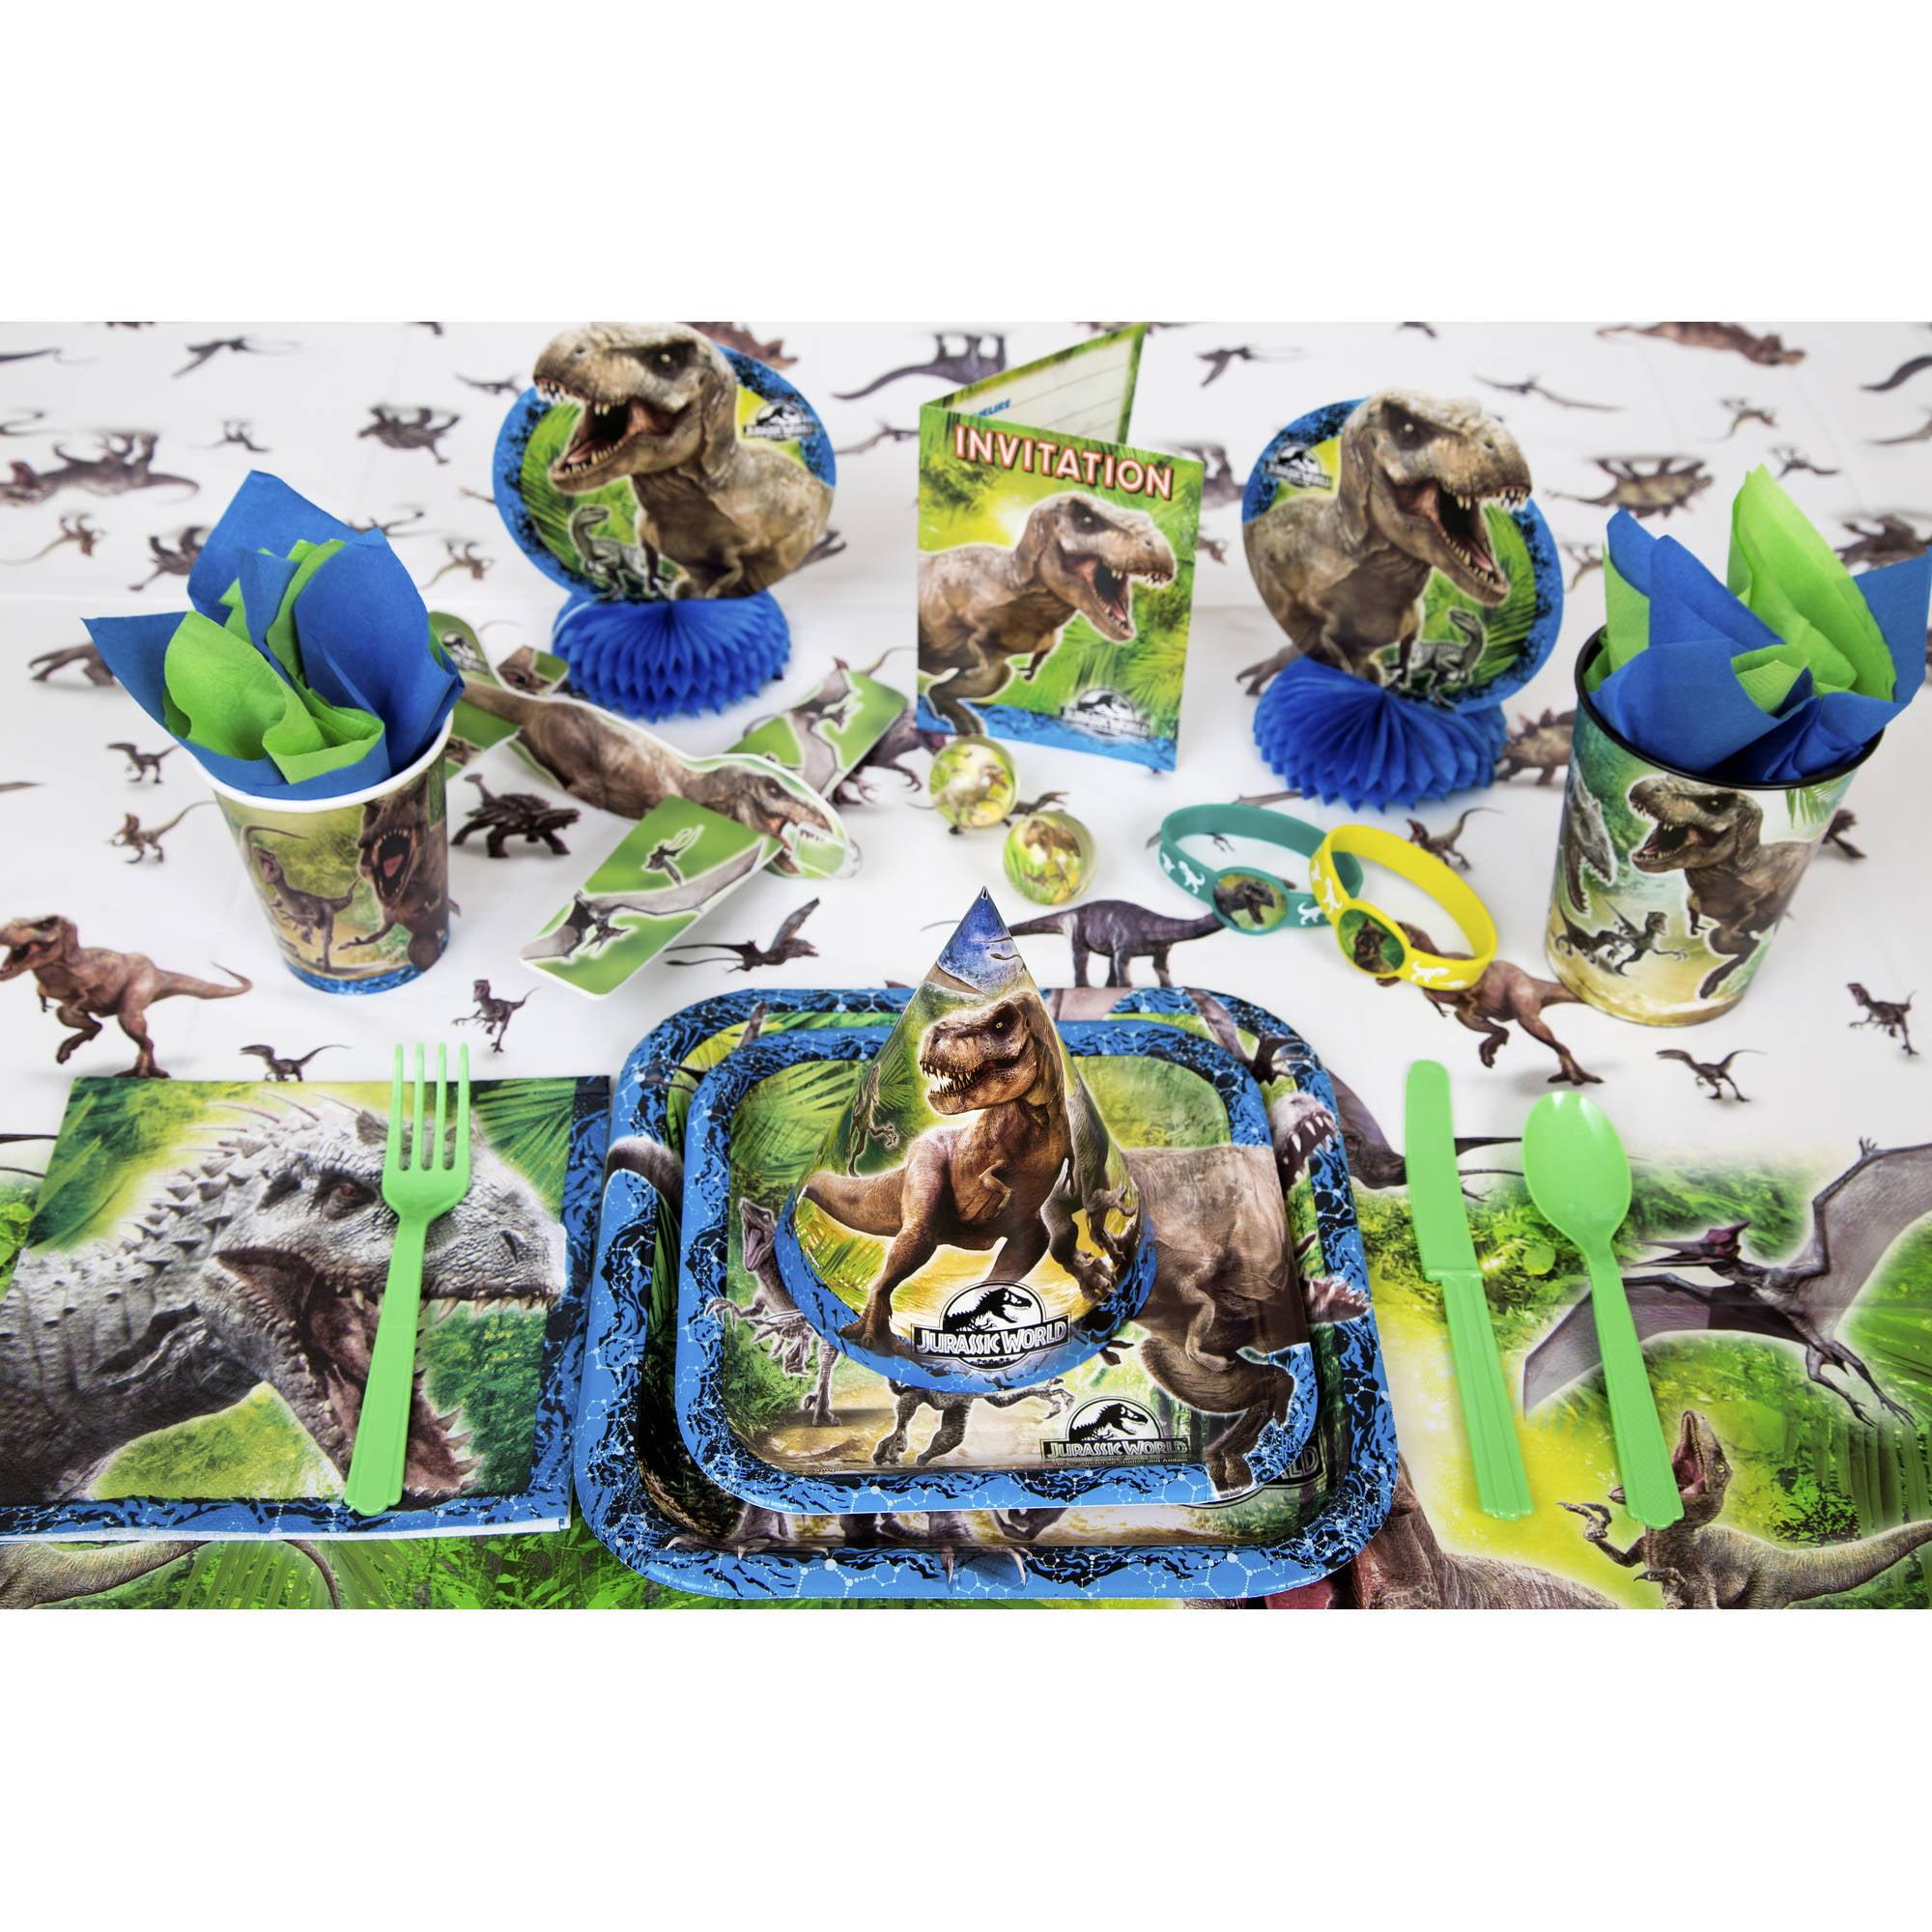 Plastic Jurassic World Table Cover 84 x 54 Walmartcom